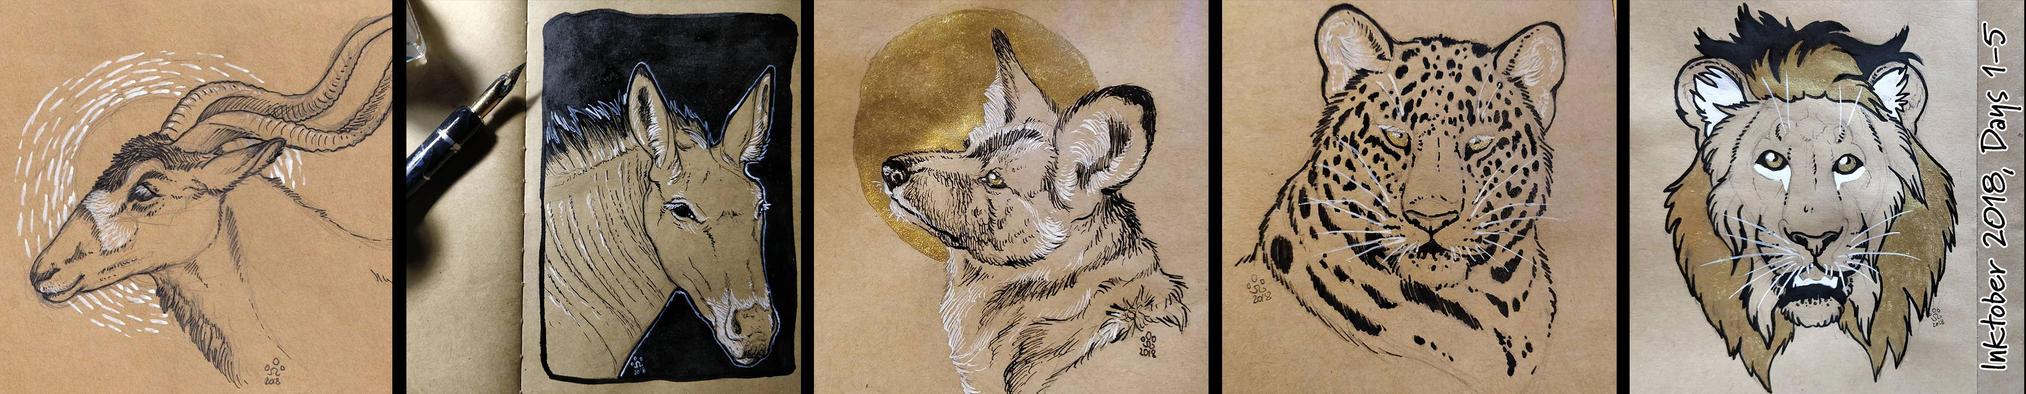 Inktober 2018, Days 1-5 by BloodhoundOmega